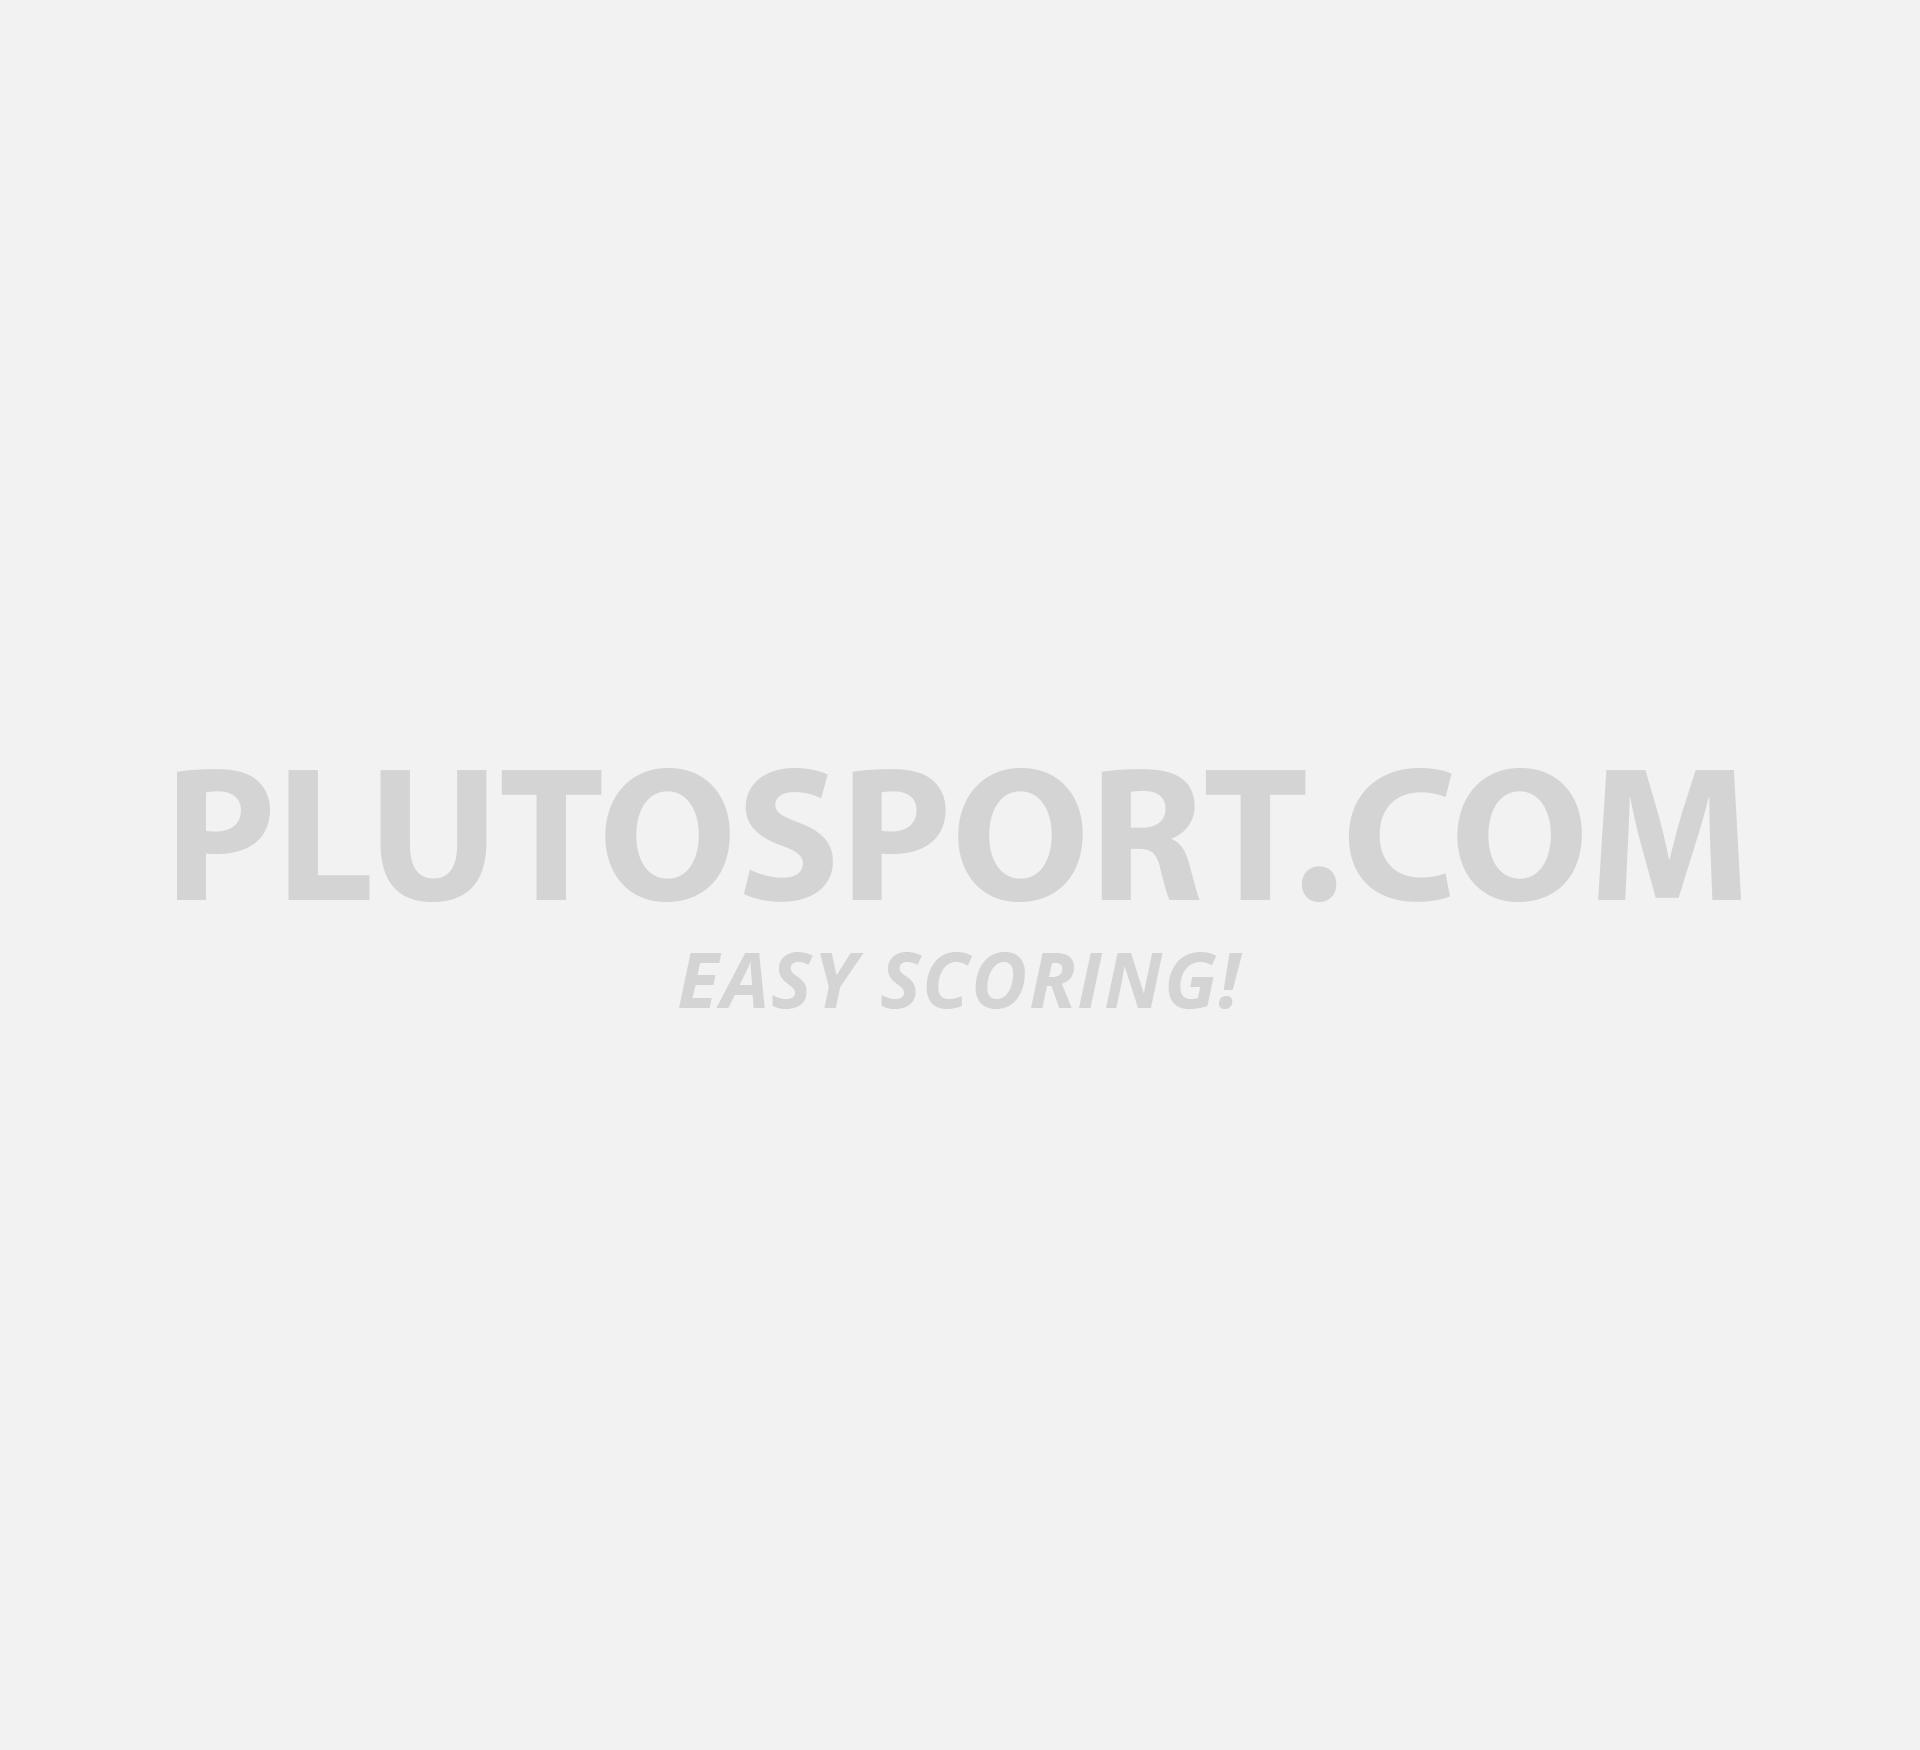 df0583c7f3fa Adidas F50 adiZero TRX FG Footballshoe for men - Boots fixed stud - Shoes -  Football - Sports | Plutosport